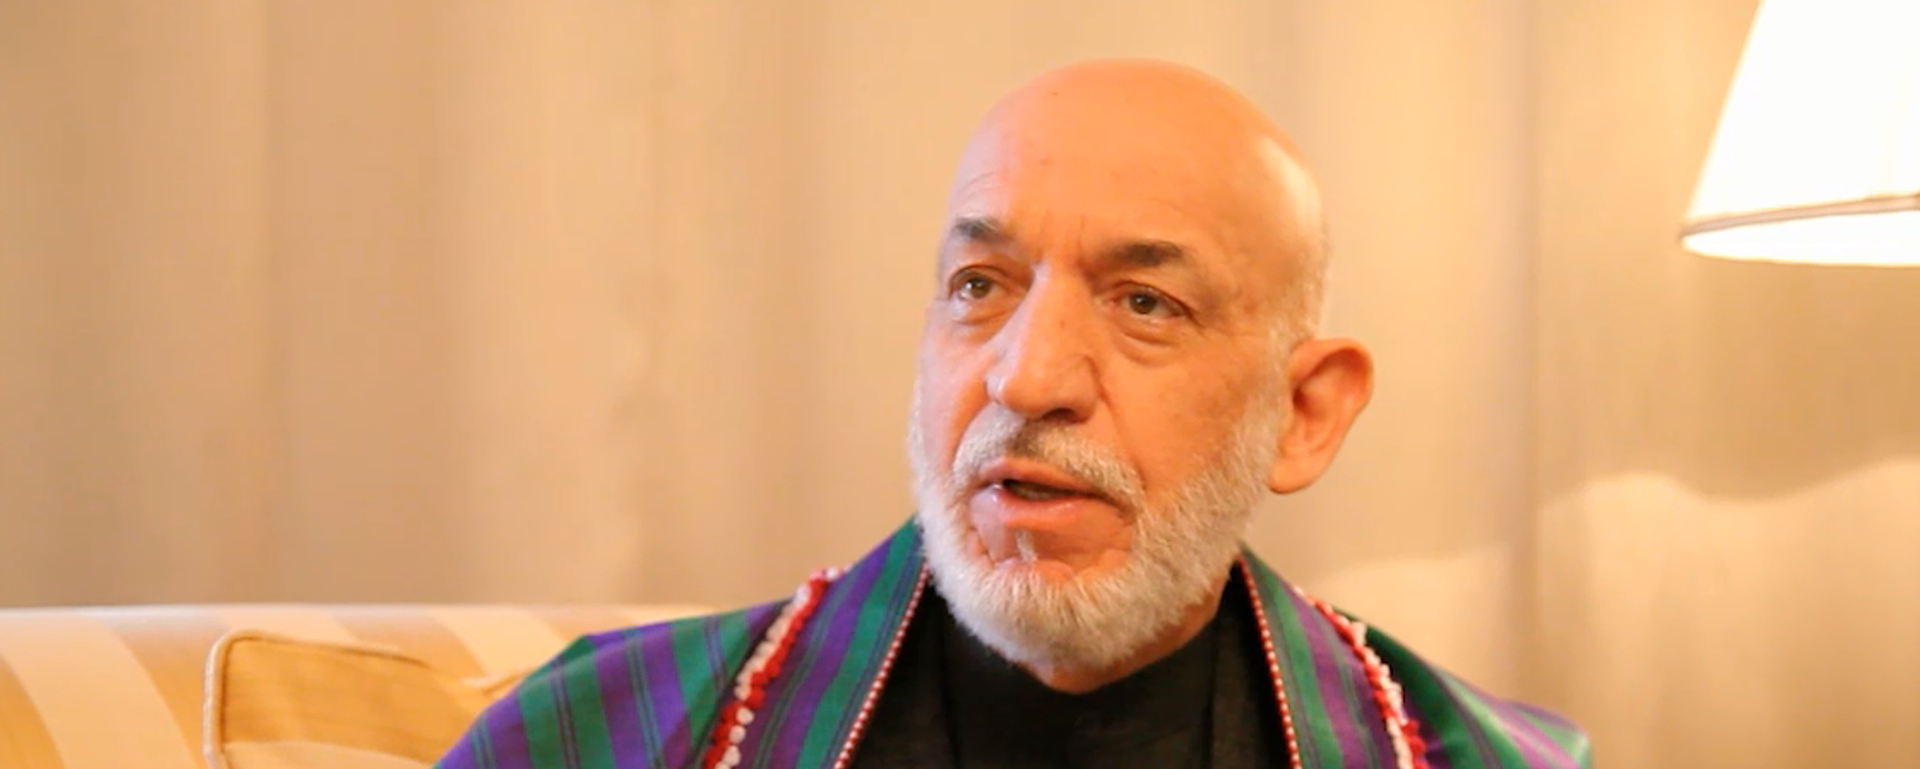 Бывший президент афганистана Хамид Карзай - Sputnik Таджикистан, 1920, 22.09.2021